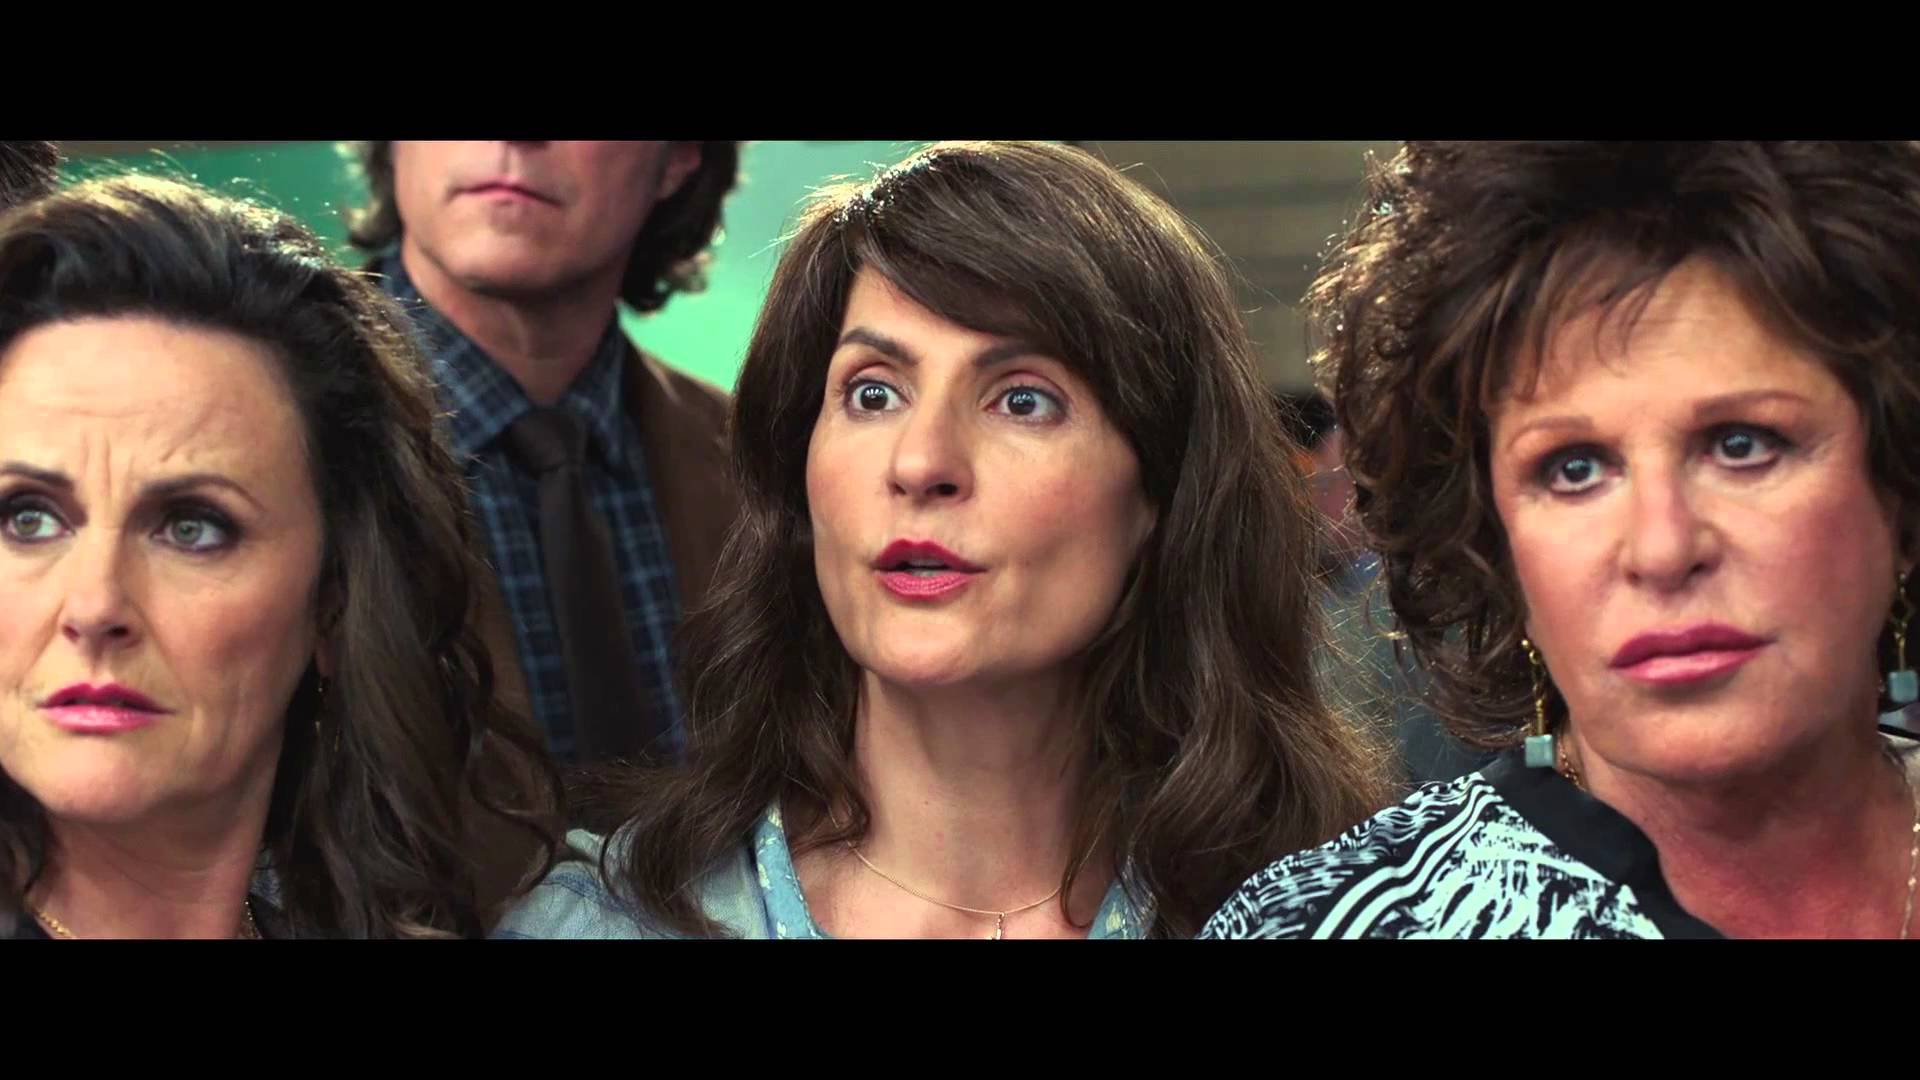 My Big Fat Greek Wedding 2: Trailer 1 (Universal Pictures)